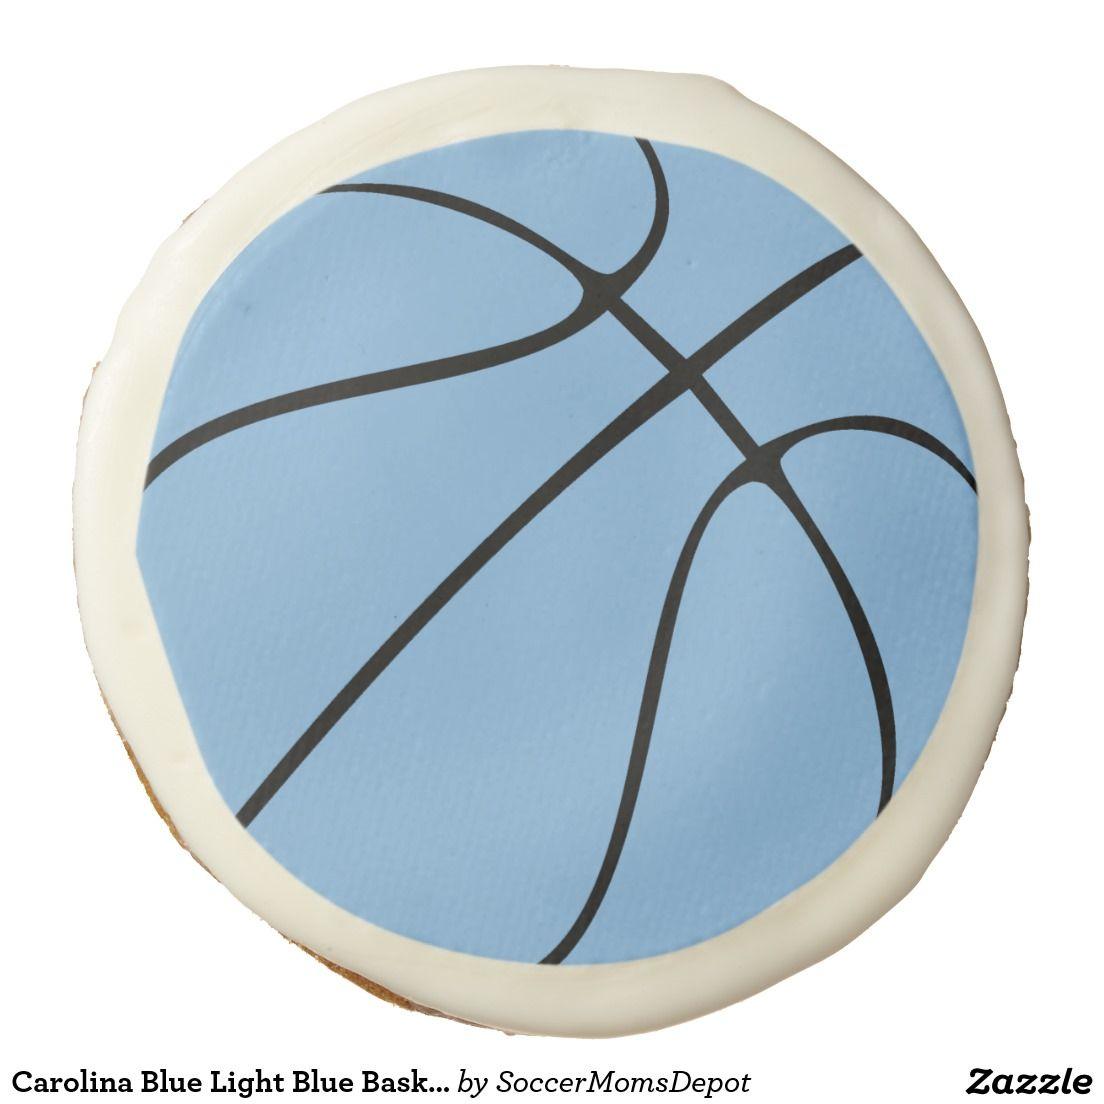 Carolina Blue Light Blue #Basketball Sugar Cookies #tarheels #marchmadness #carolinablue